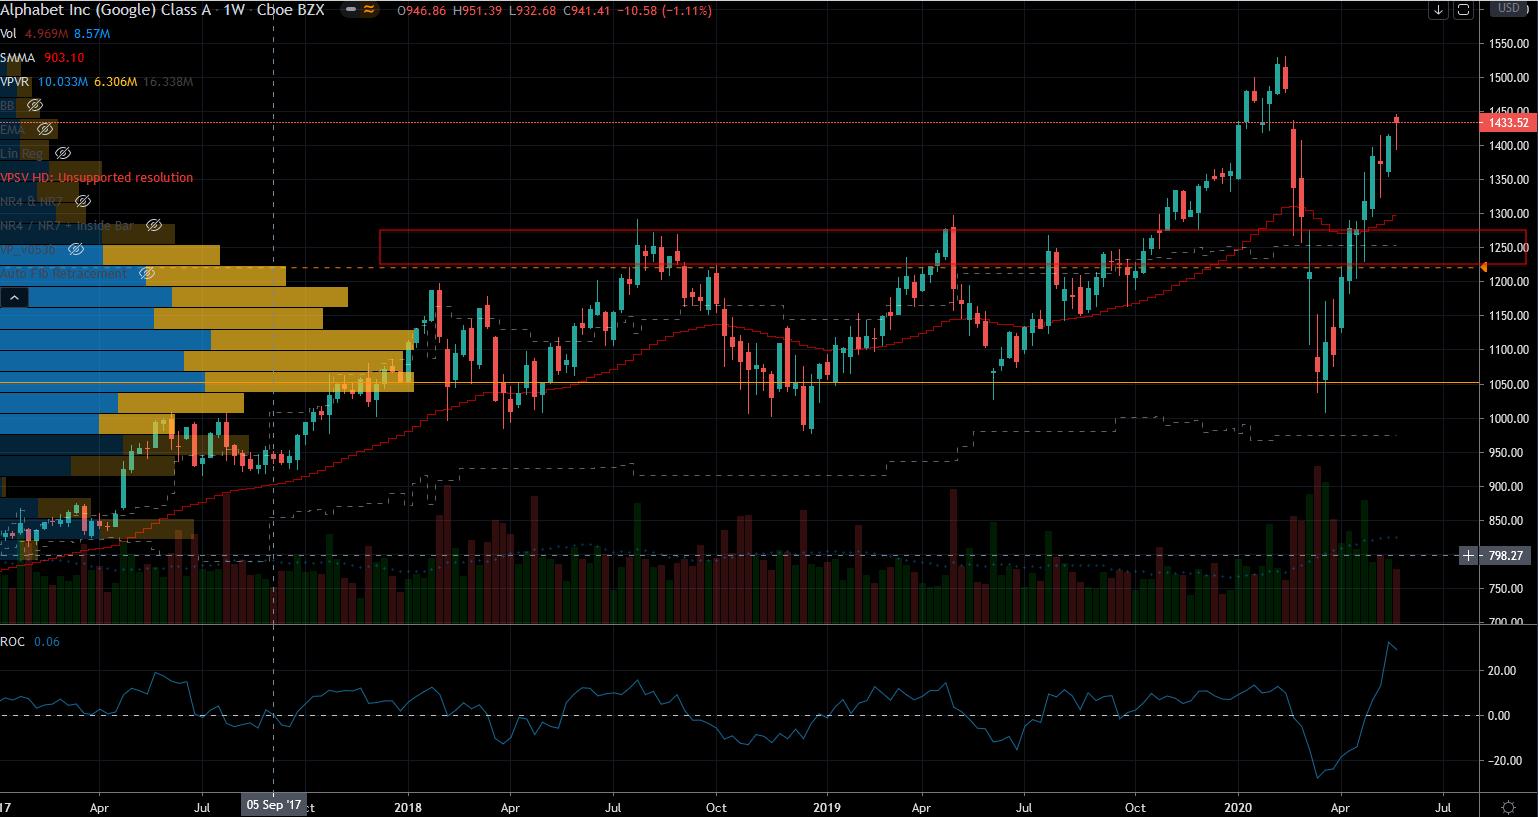 Fang Stocks: GOOGL Stock Chart